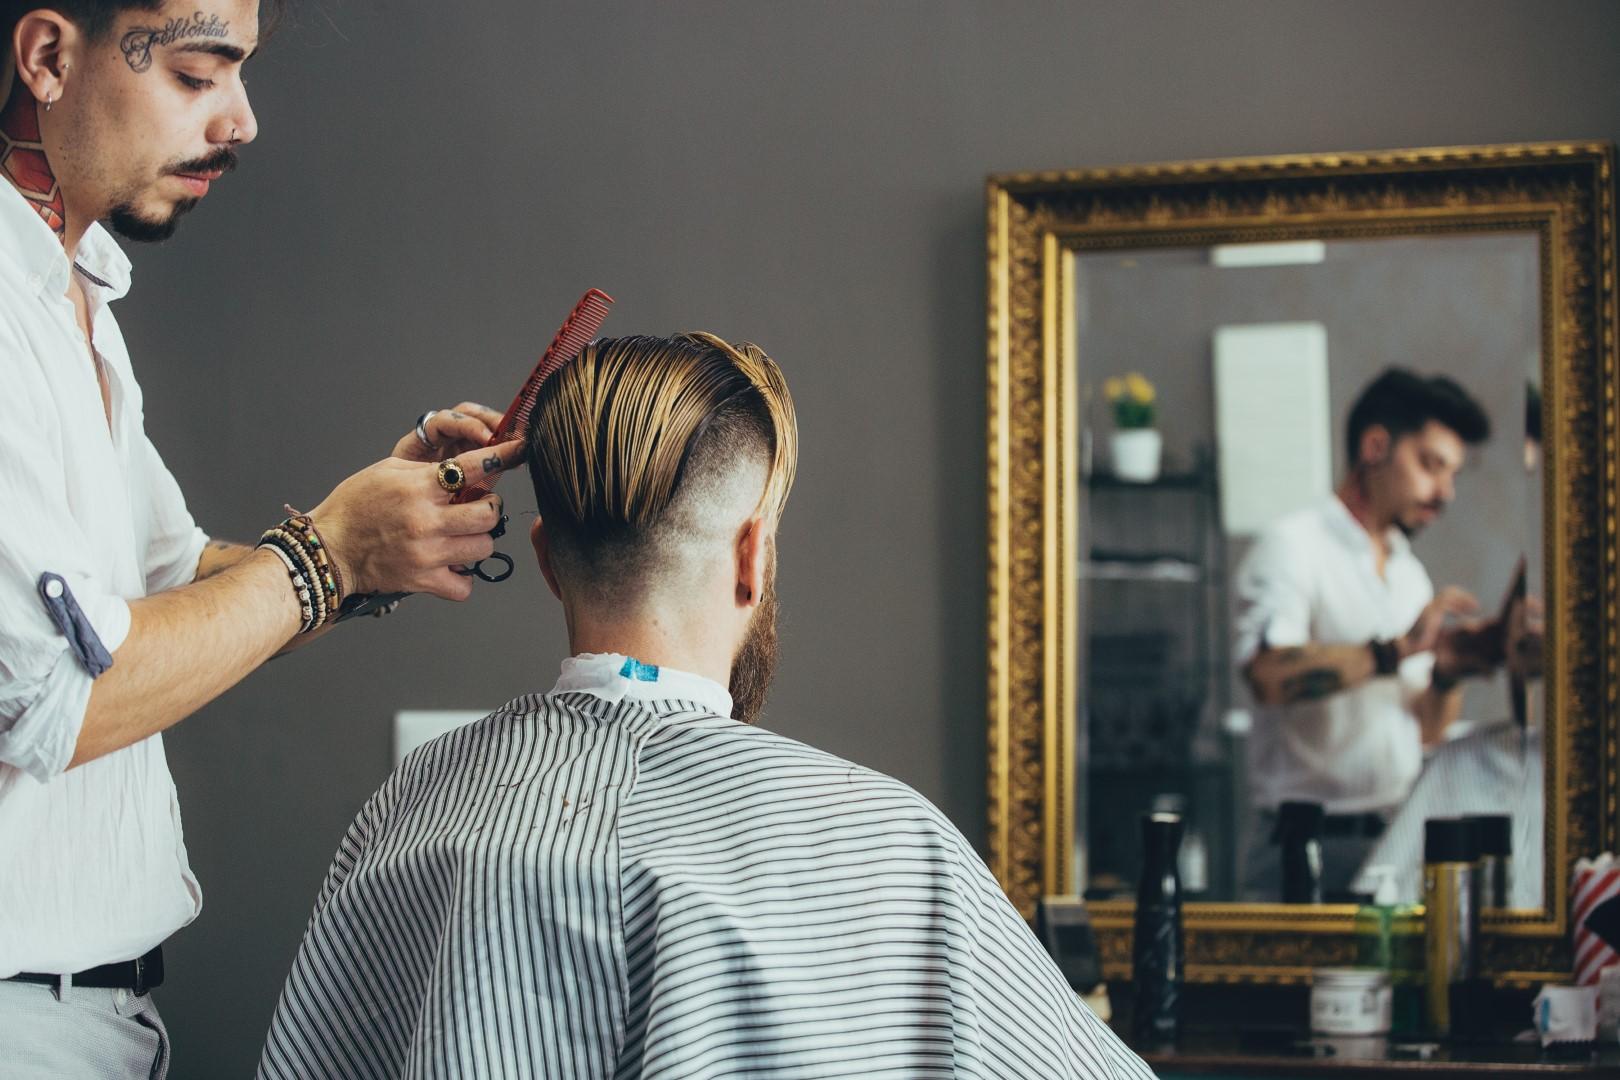 Haircut in barber shop